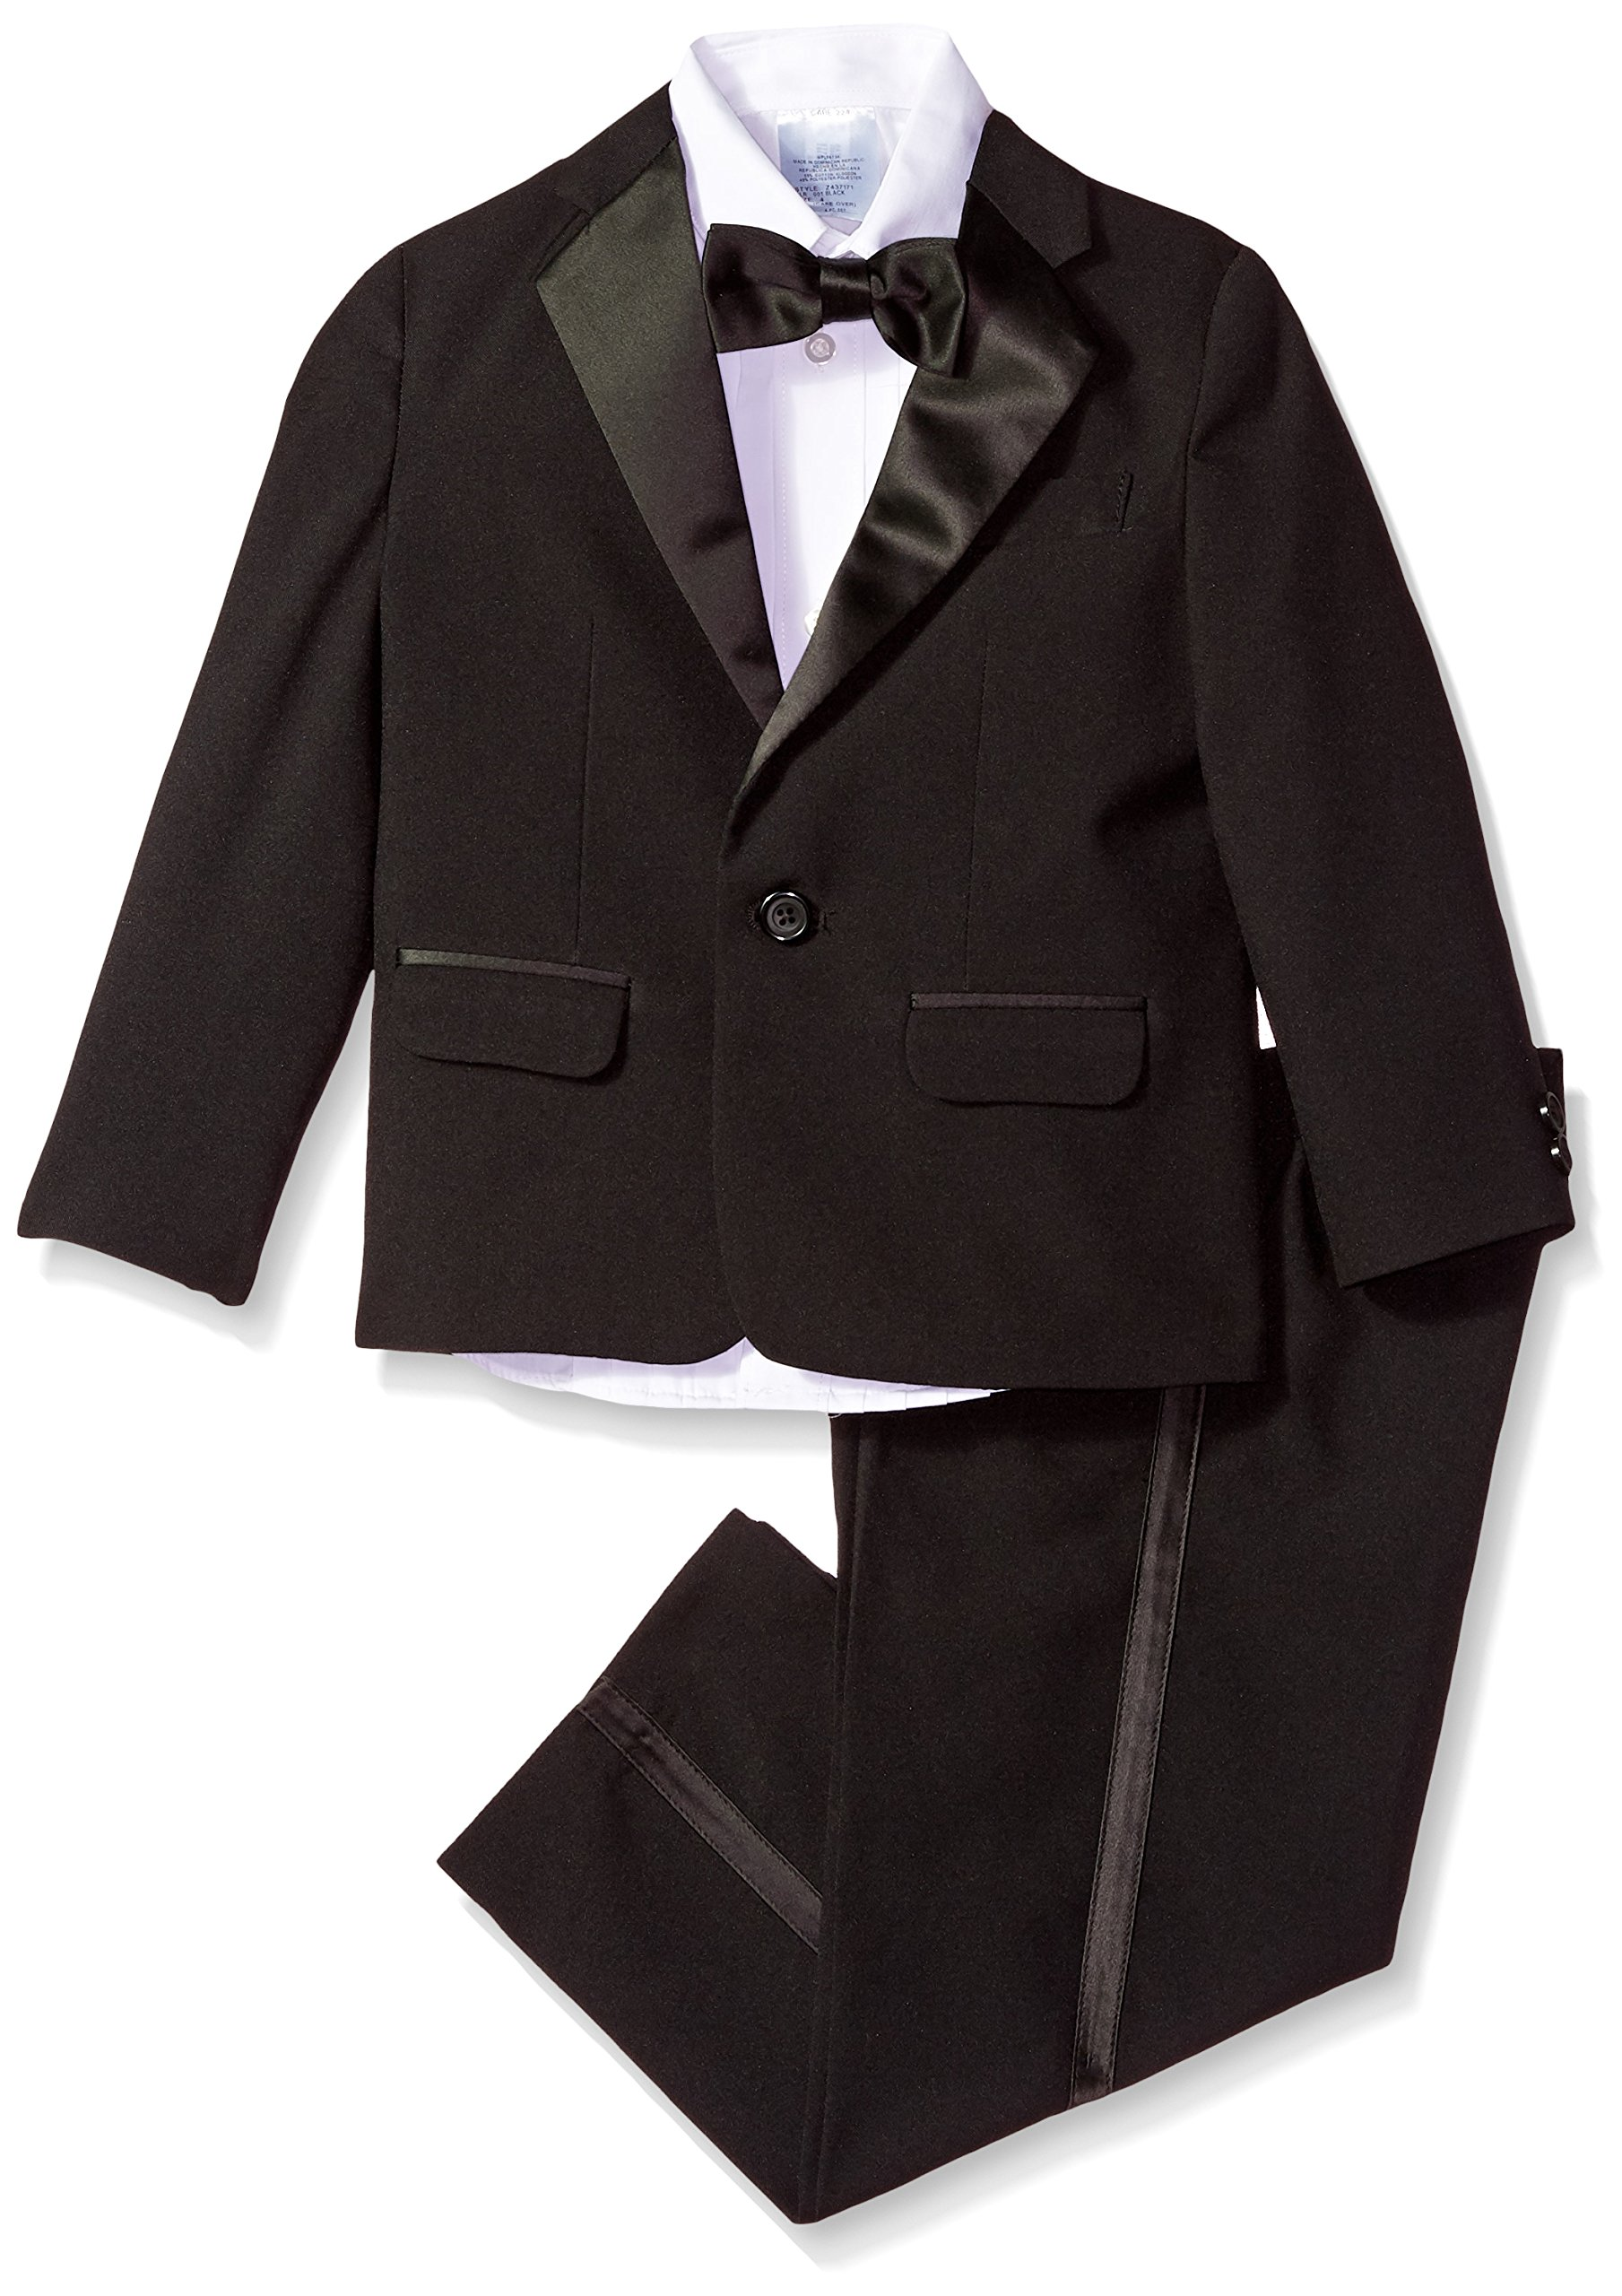 Izod boys 4-Piece Formal Tuxedo Set with Jacket, Pants, Shirt, and Bow Tie, Black, 7